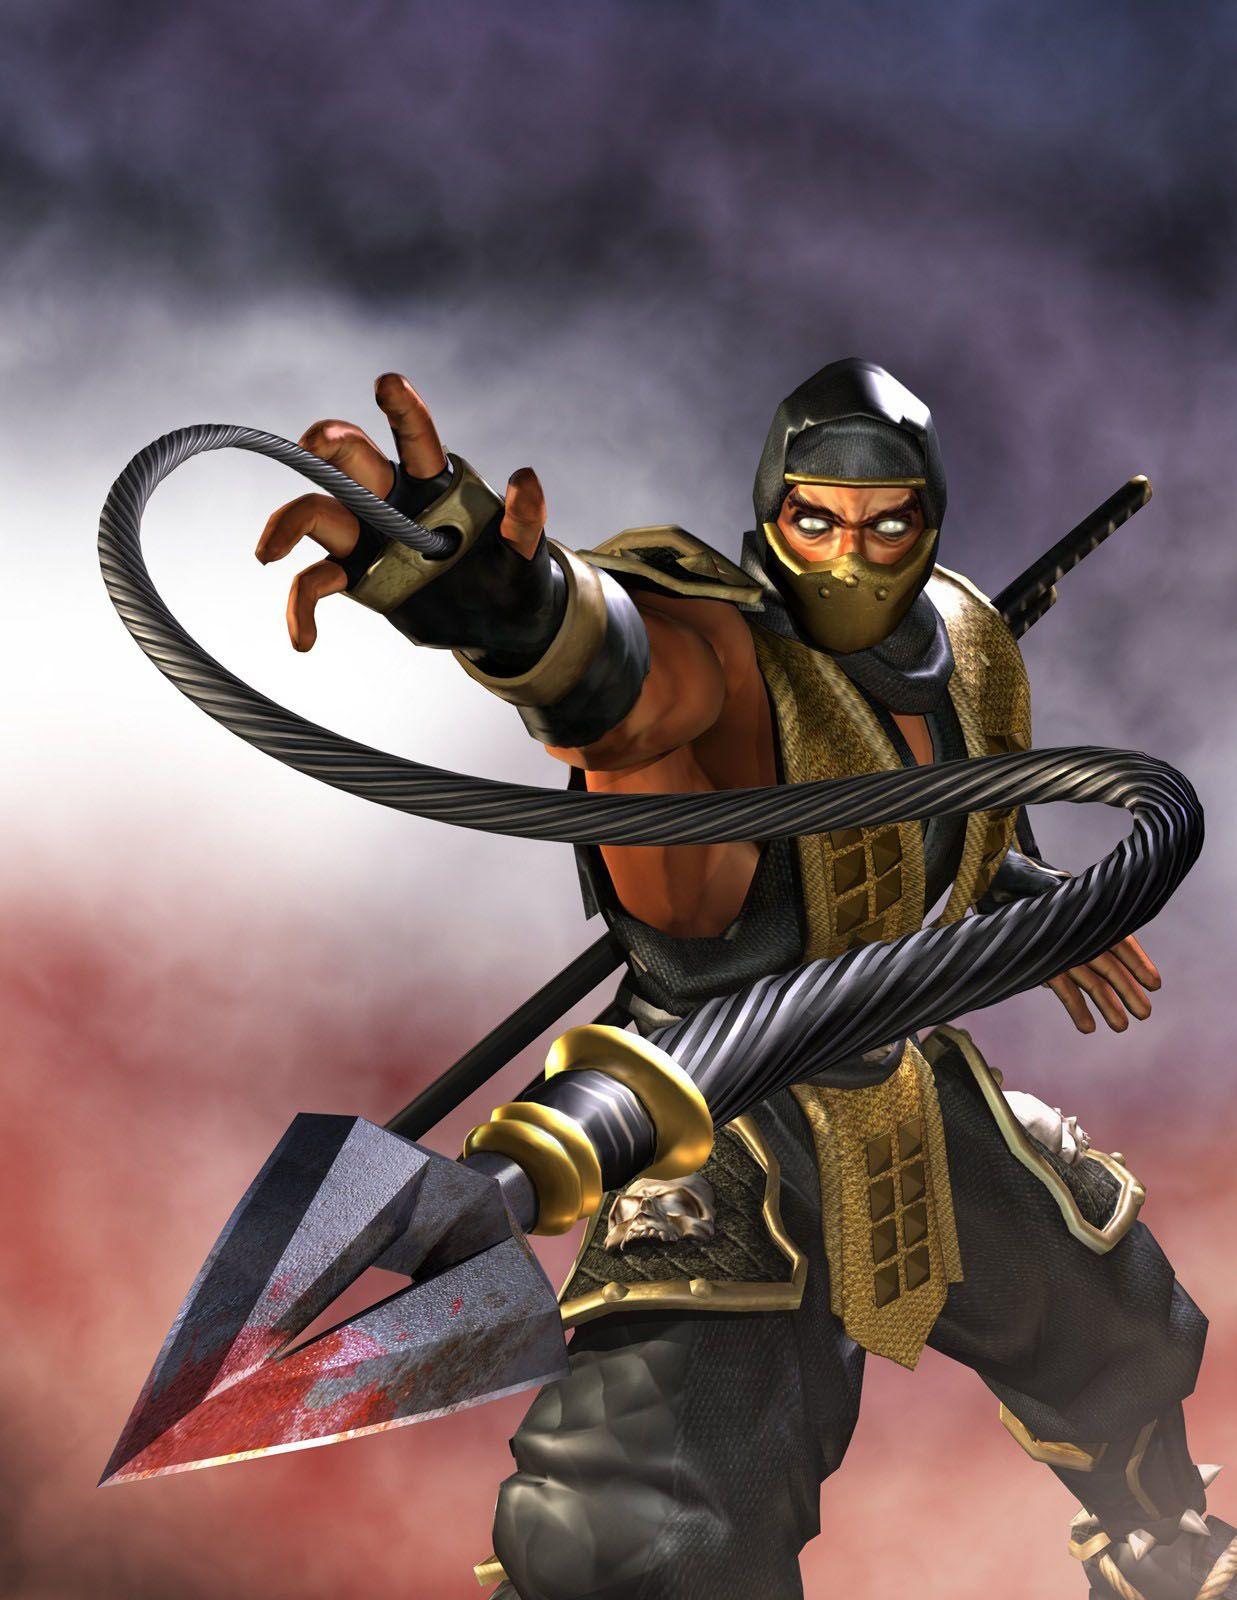 Mortal kombat scorpion mortal kombat scorpion mortal